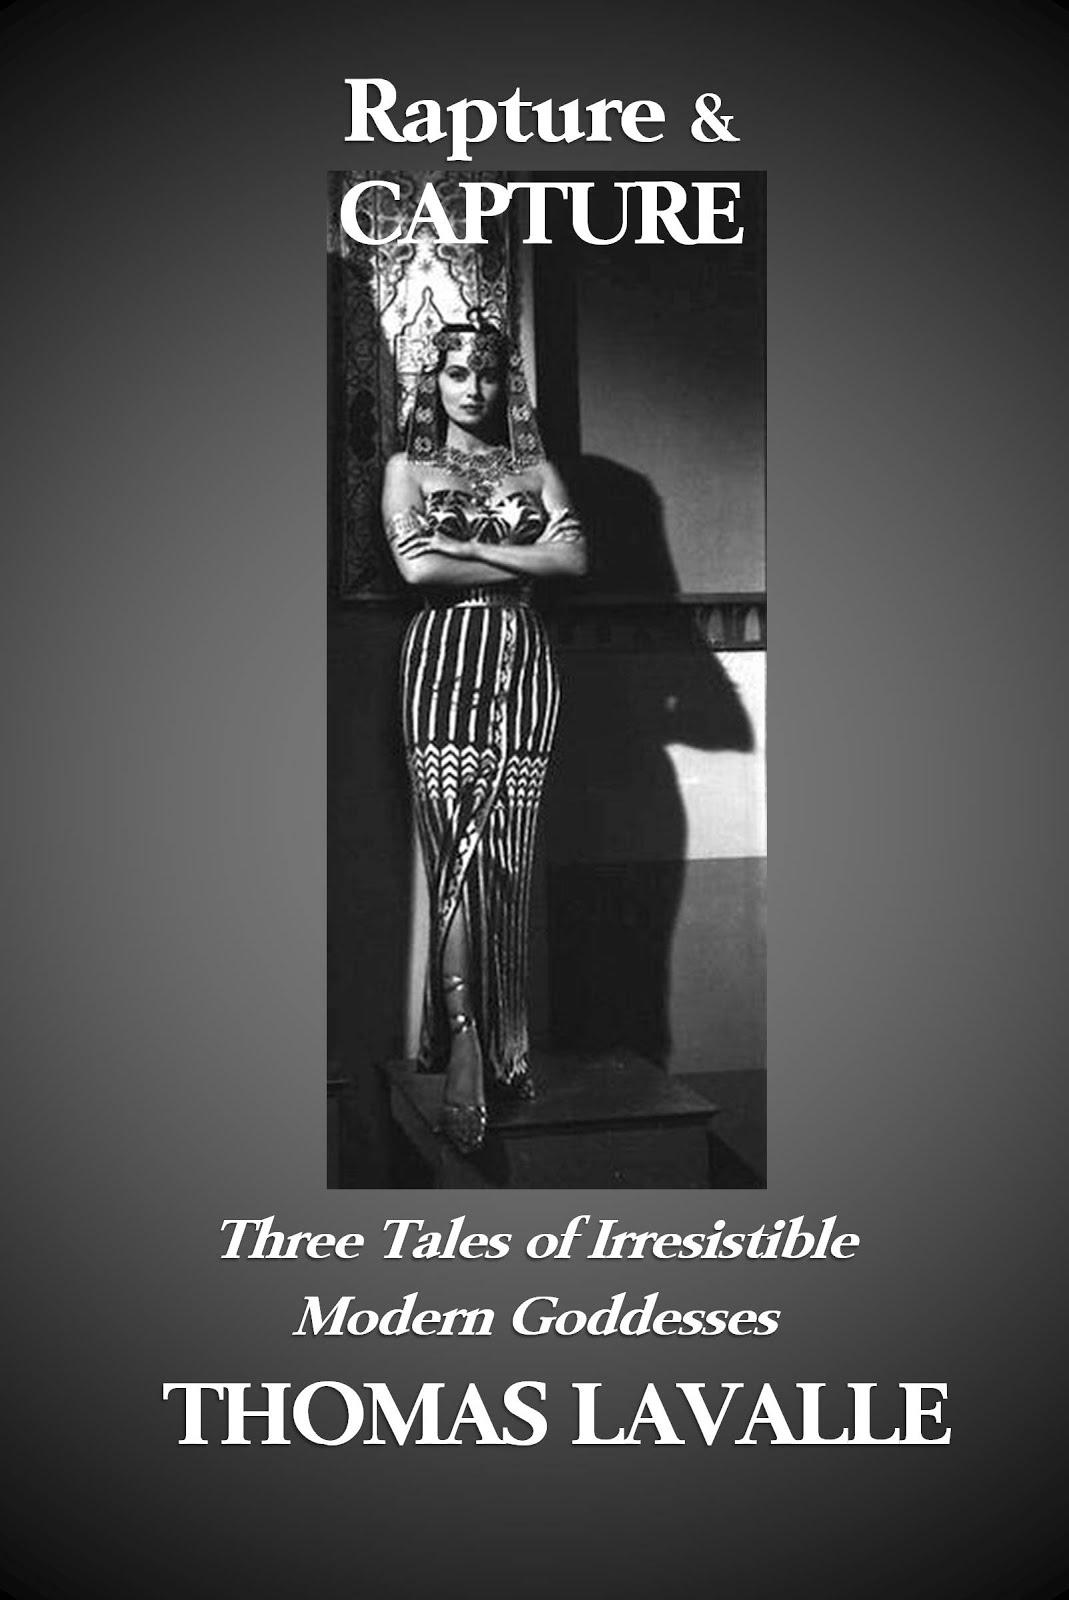 <b>3 IRRESISTIBLE MODERN GODDESSES</b>